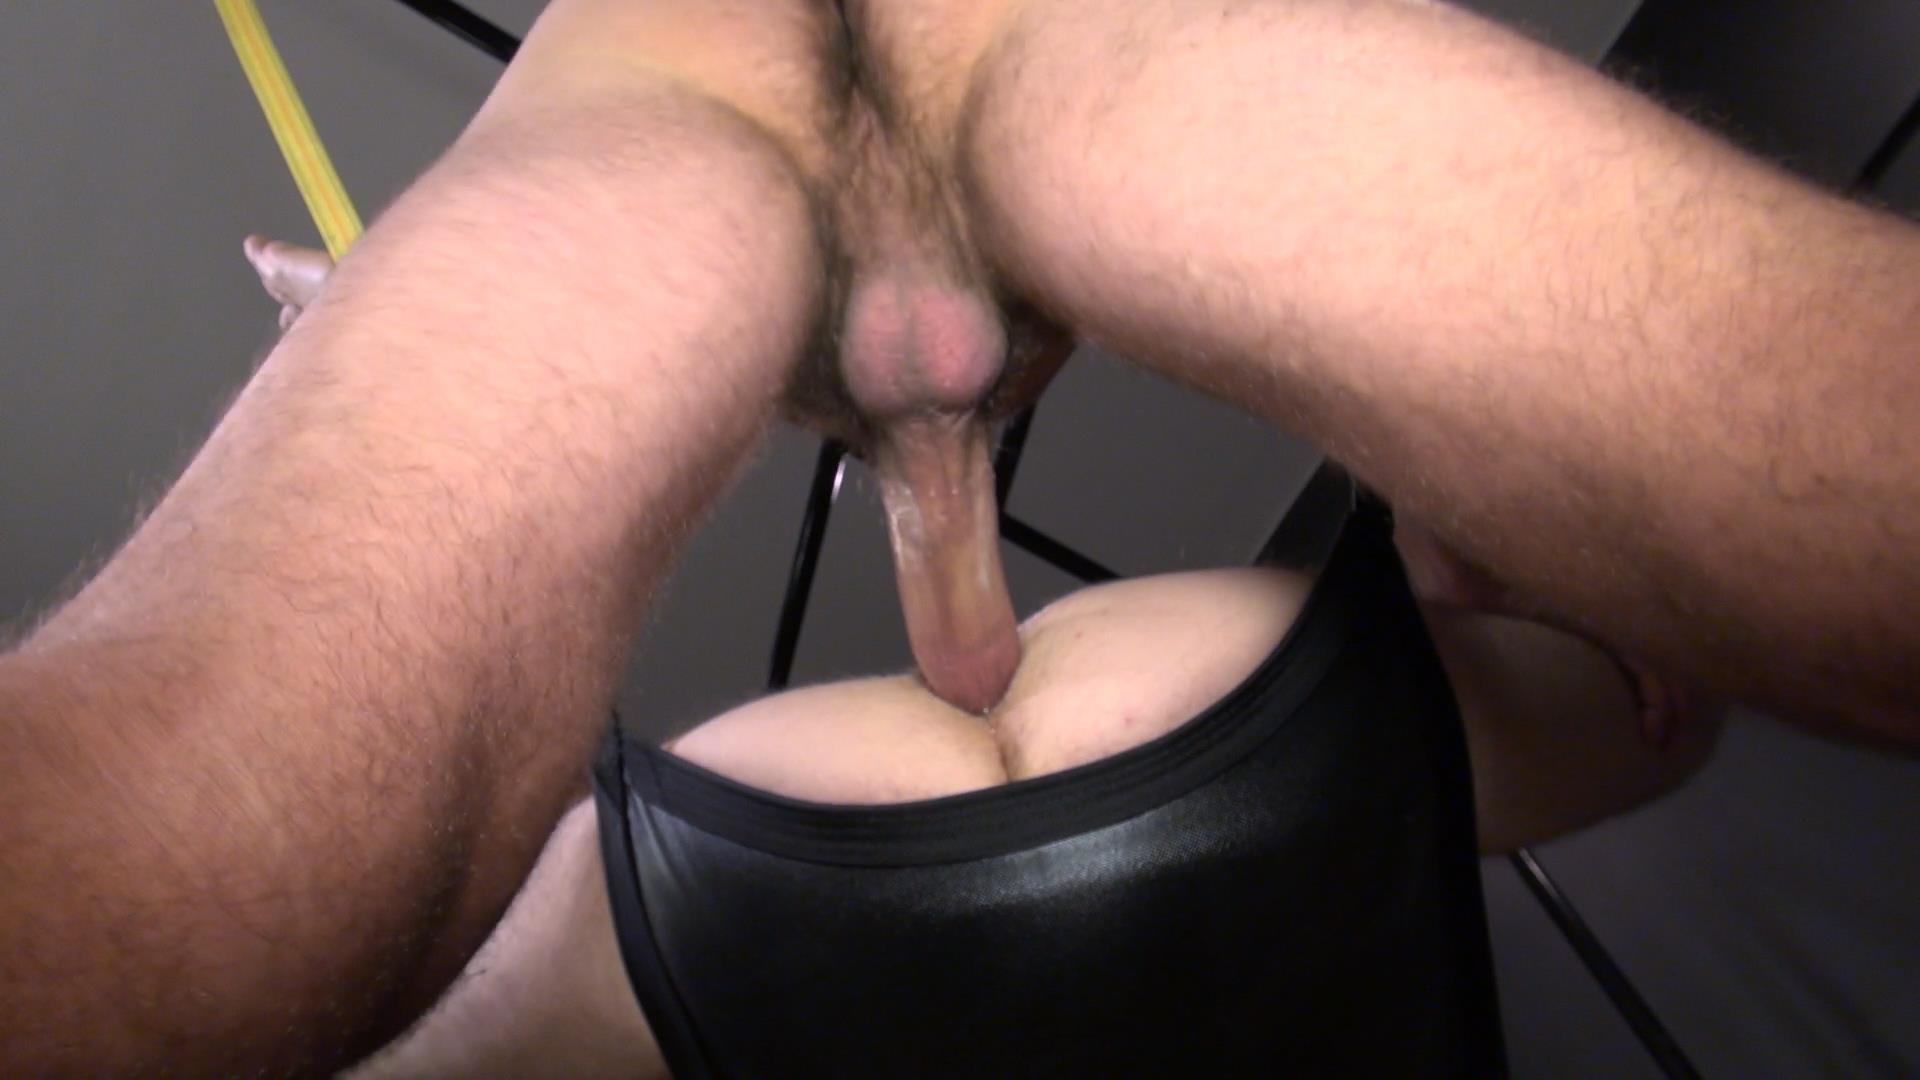 Raw-and-Rough-Blake-Dawson-and-Super-Steve-Horse-Cock-Bareback-Breeding-Amateur-Gay-Porn-06 Huge Cock Bareback Breeding A Tight Hole In A Sex Sling